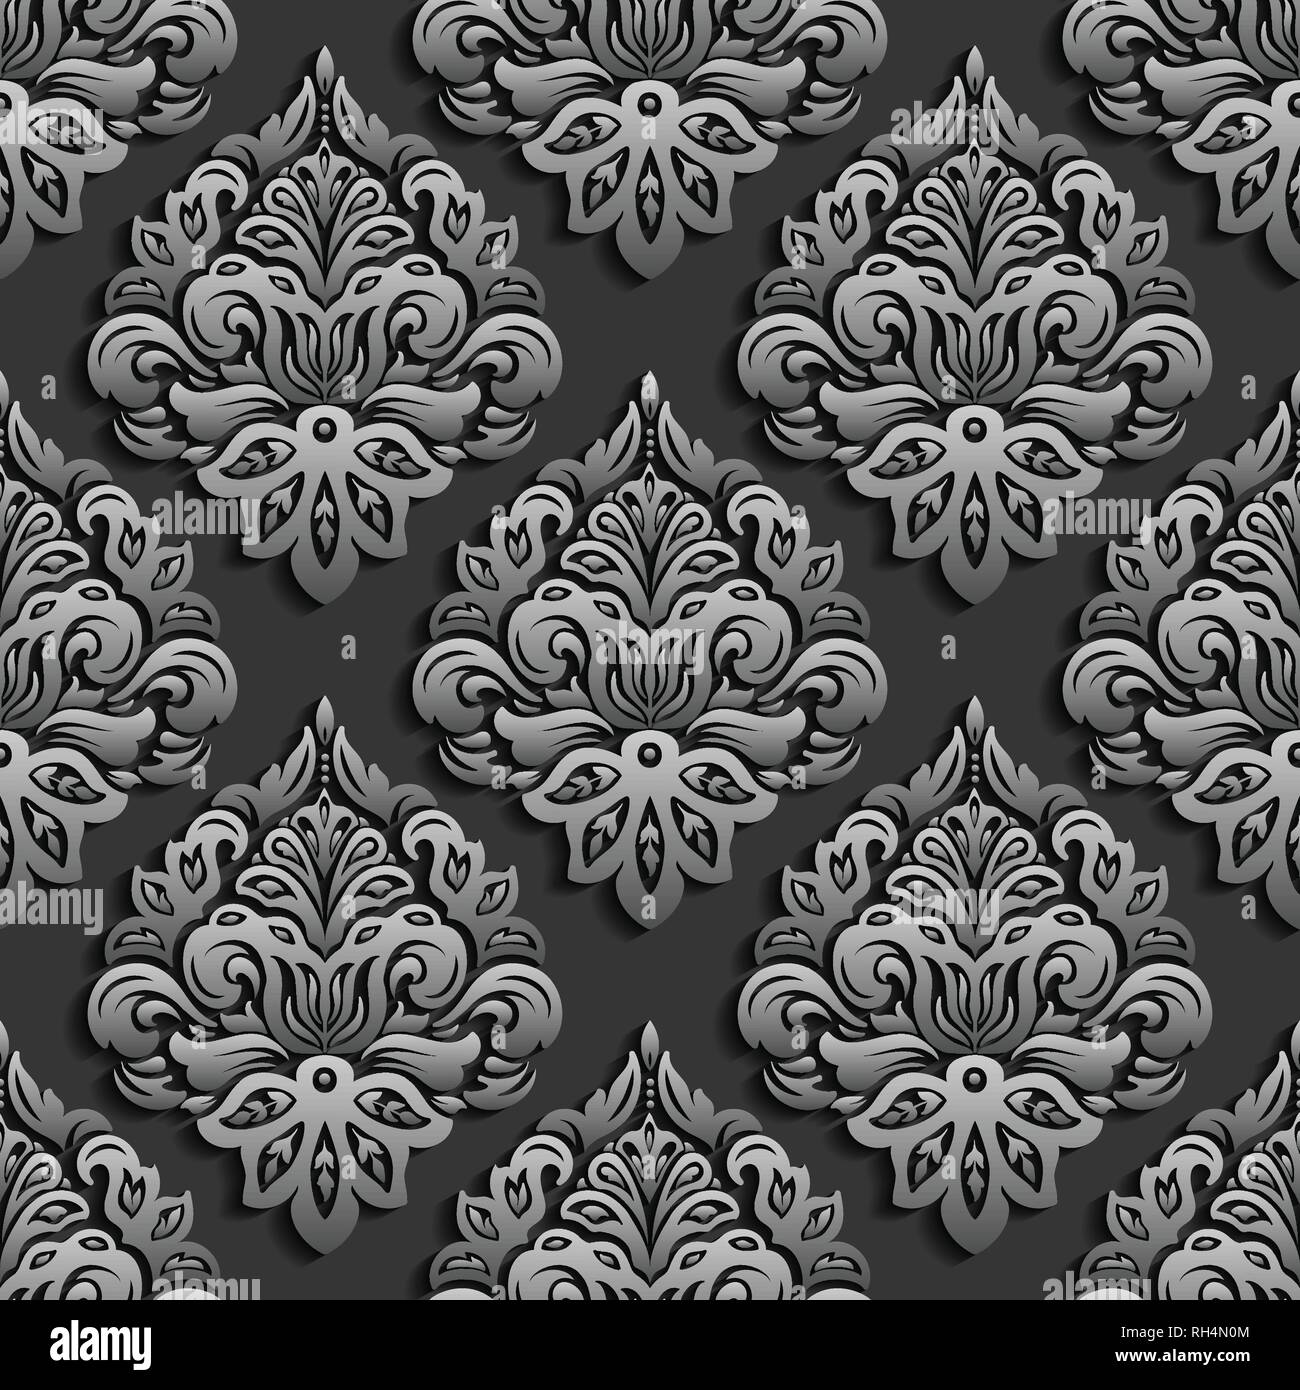 3d Dark Paper Cut Vector Damask Seamless Pattern Elegant Luxury